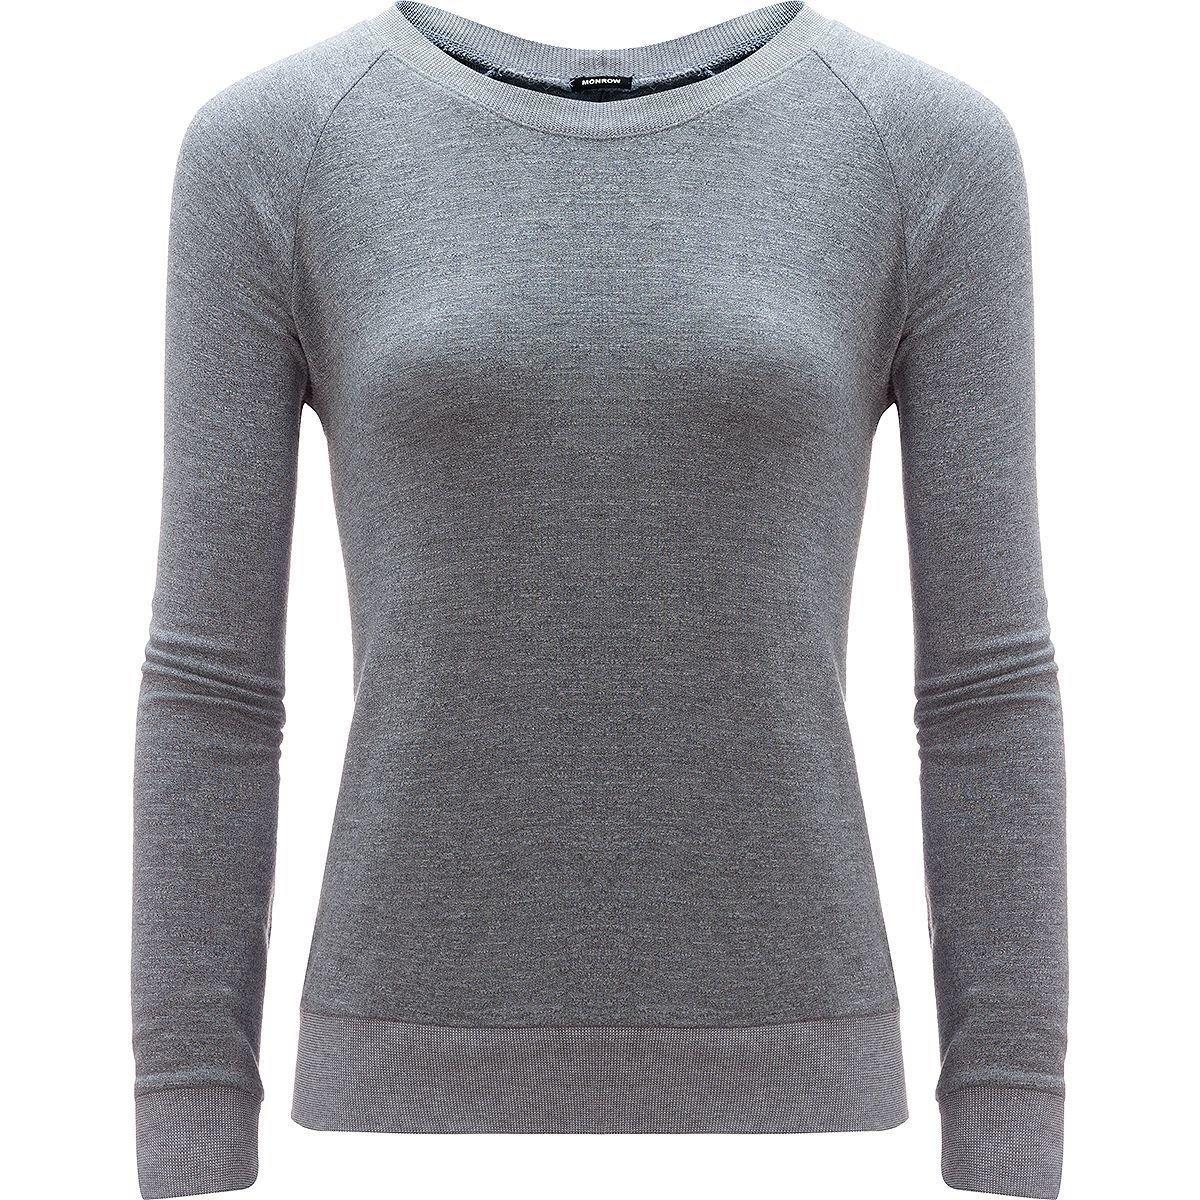 Monrow Sweatshirt With Lace Up Back - Women's Dark Heather, L